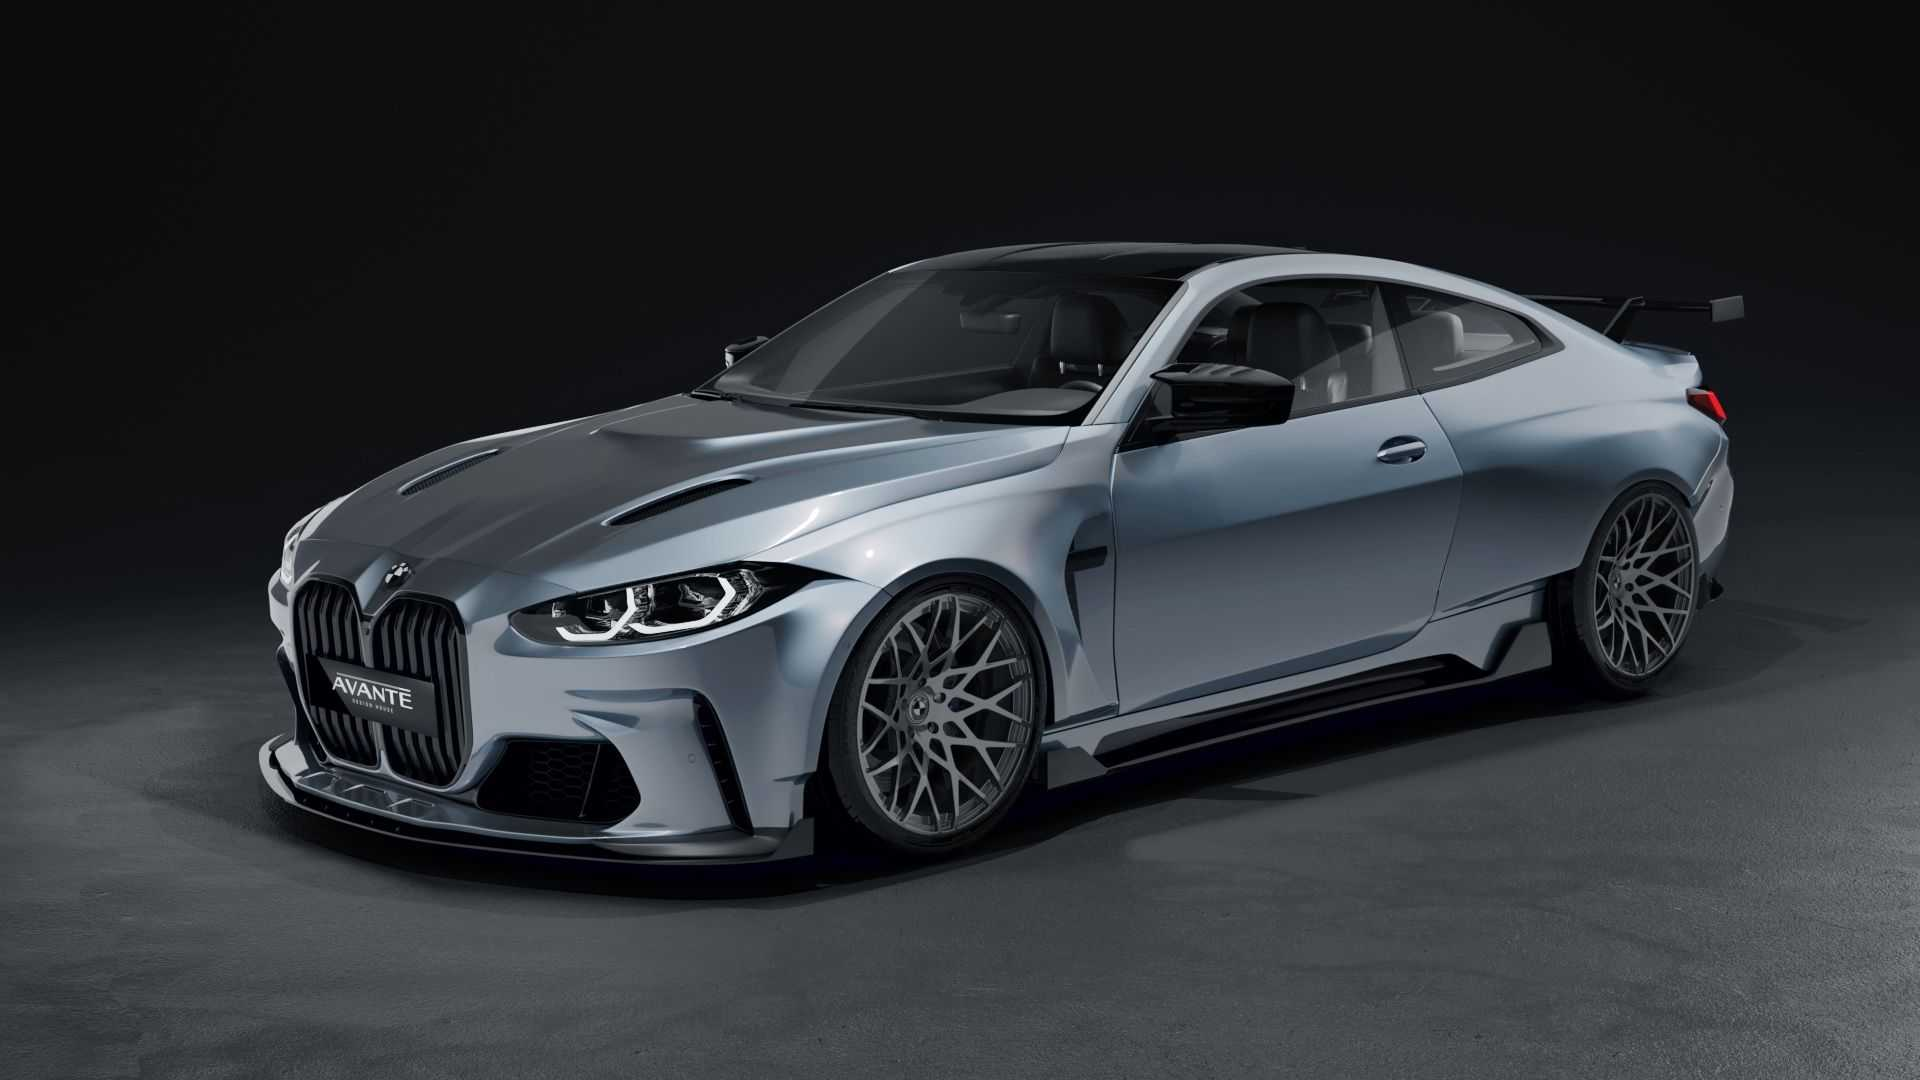 BMW-M4-by-Avante-Design-5